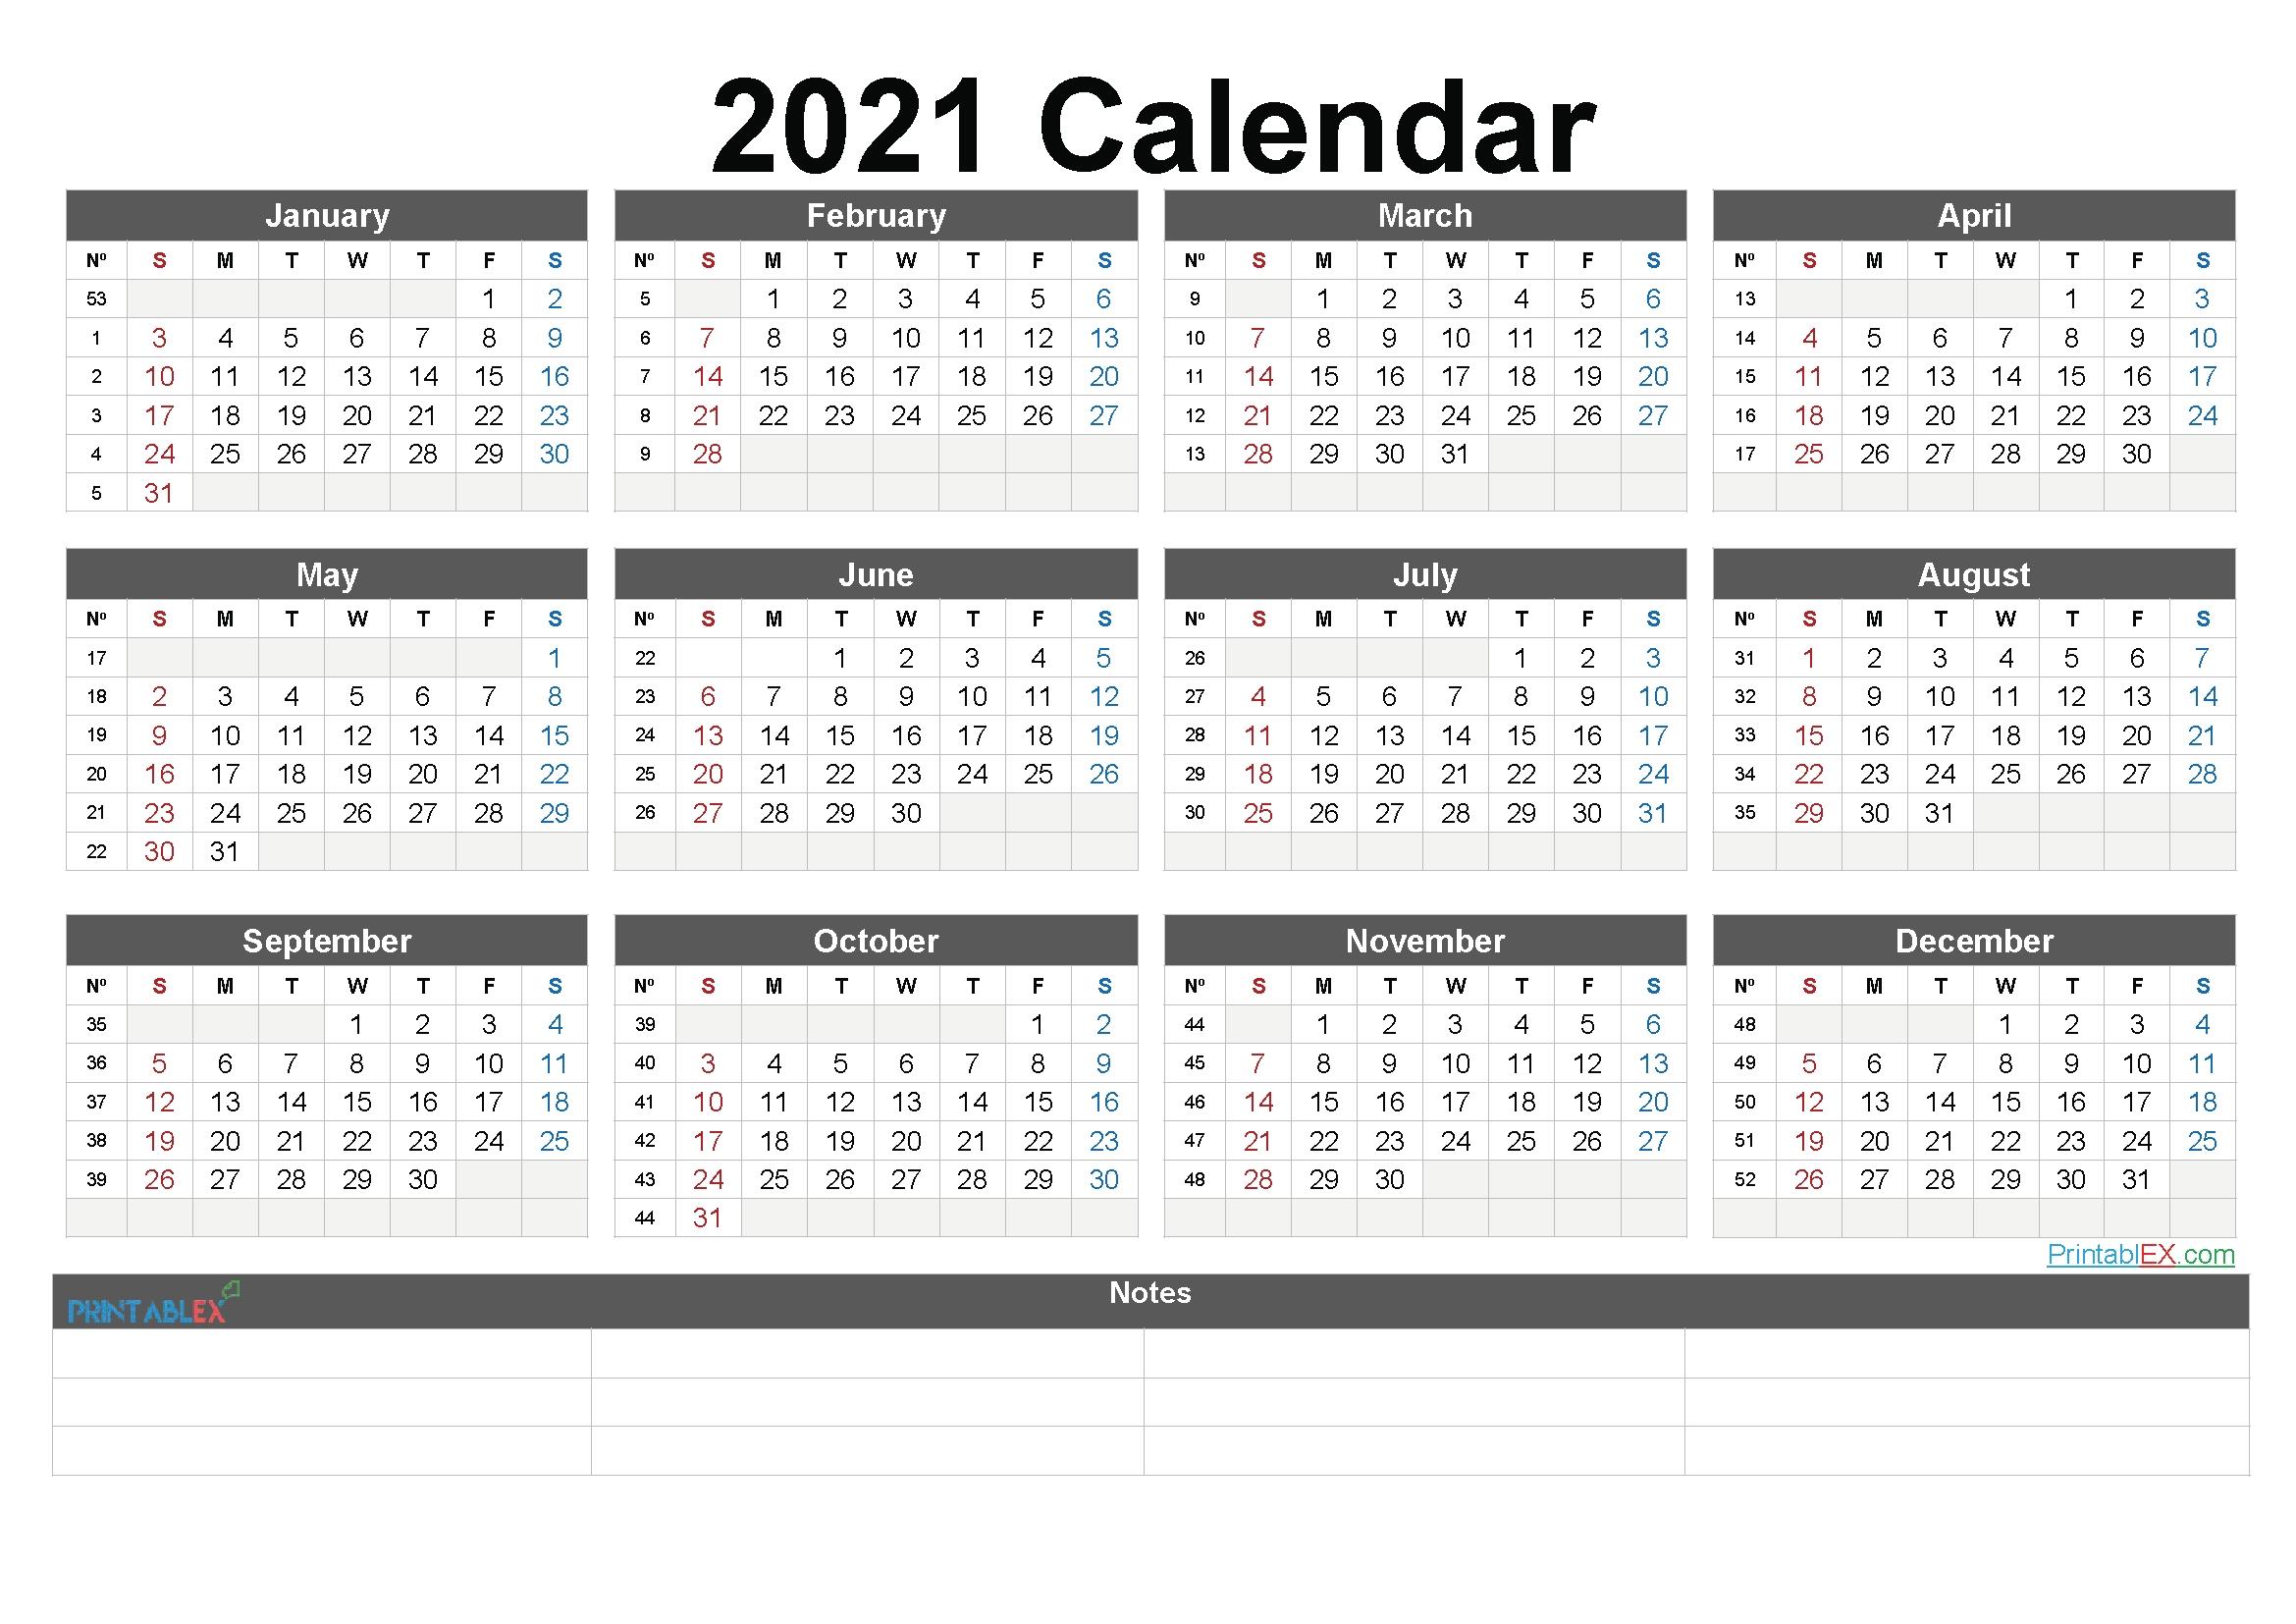 Free Downloadable 2021 Word Calendar - Blank Calendar 2021 Free Download Calendar Templates intended for Printable Weekly Calendar 2021 Photo